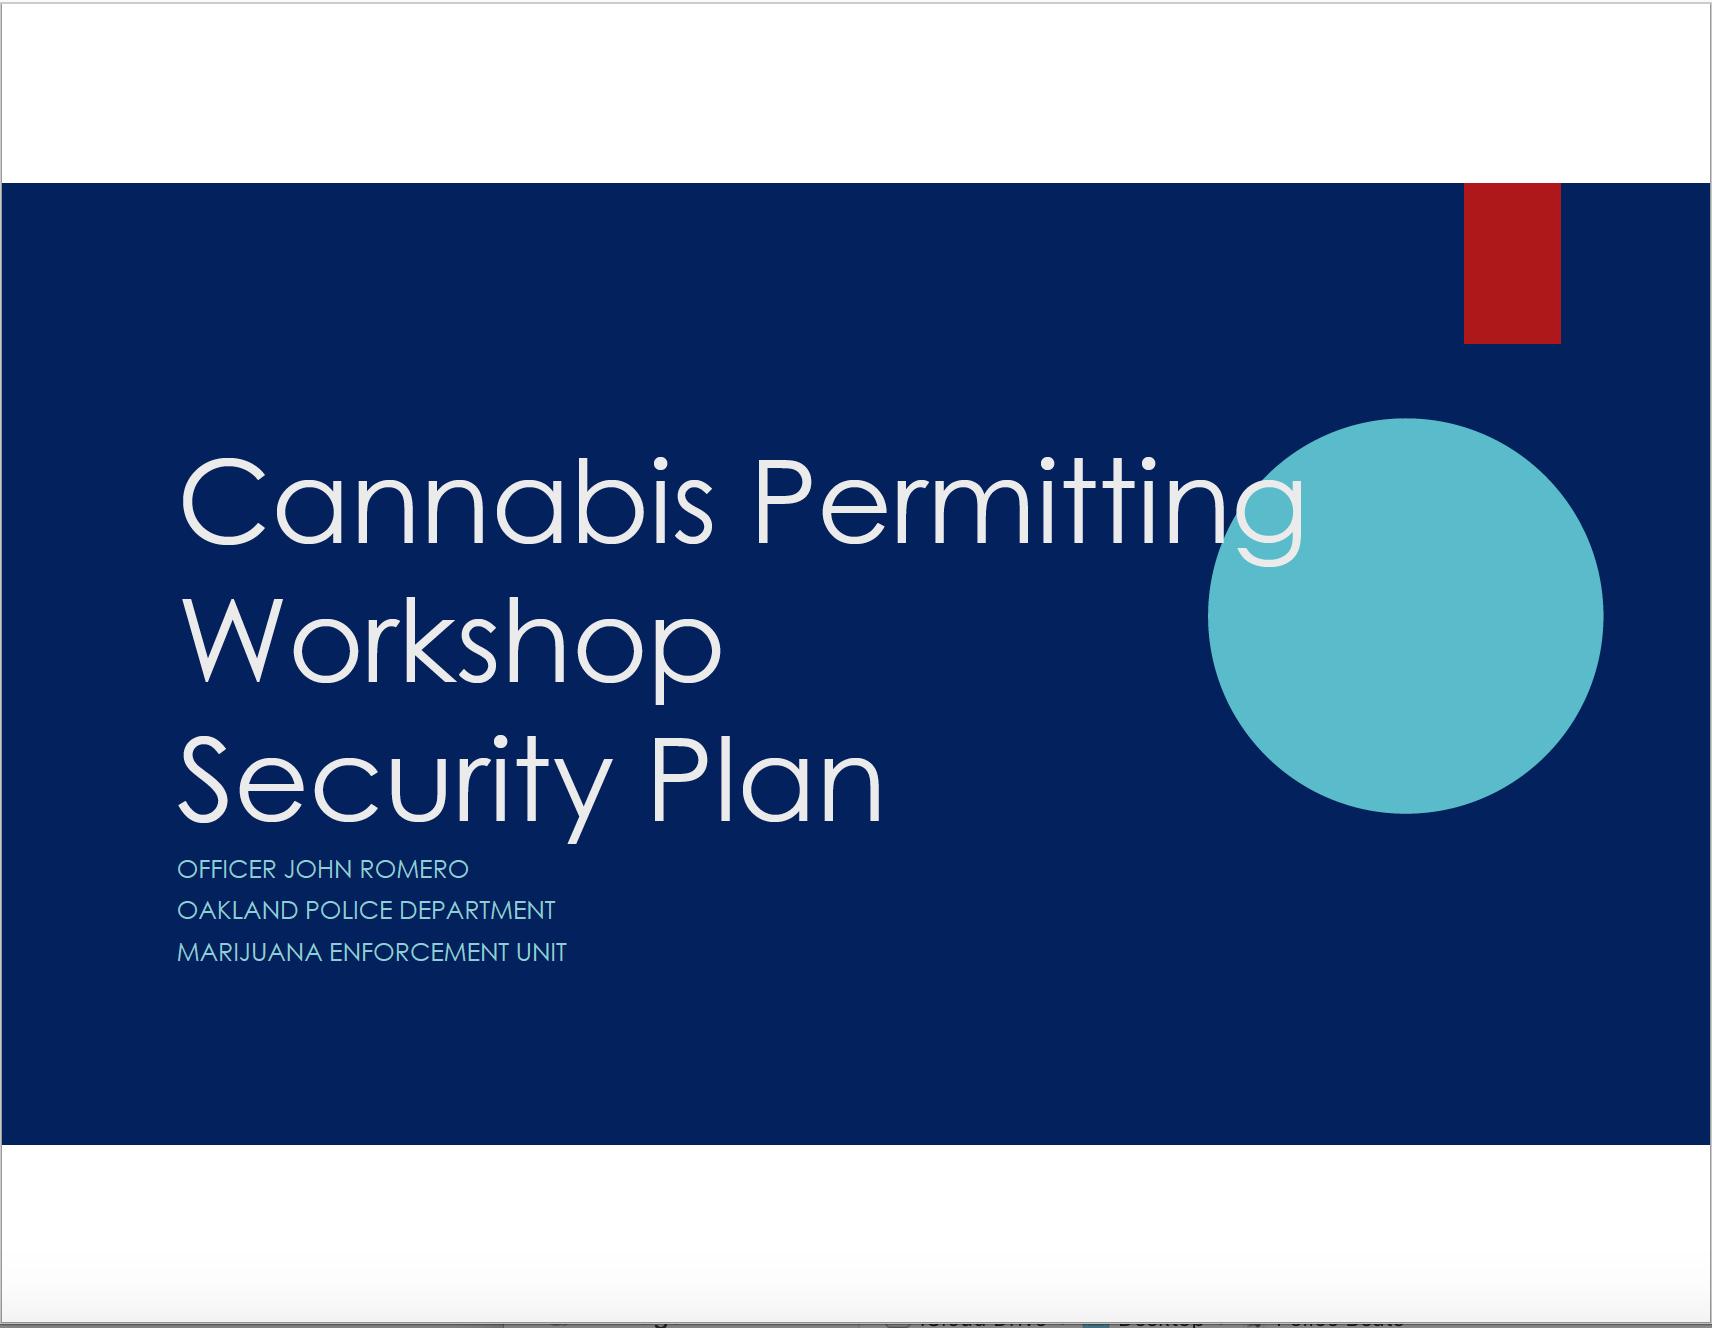 Workshop Security Plan.png